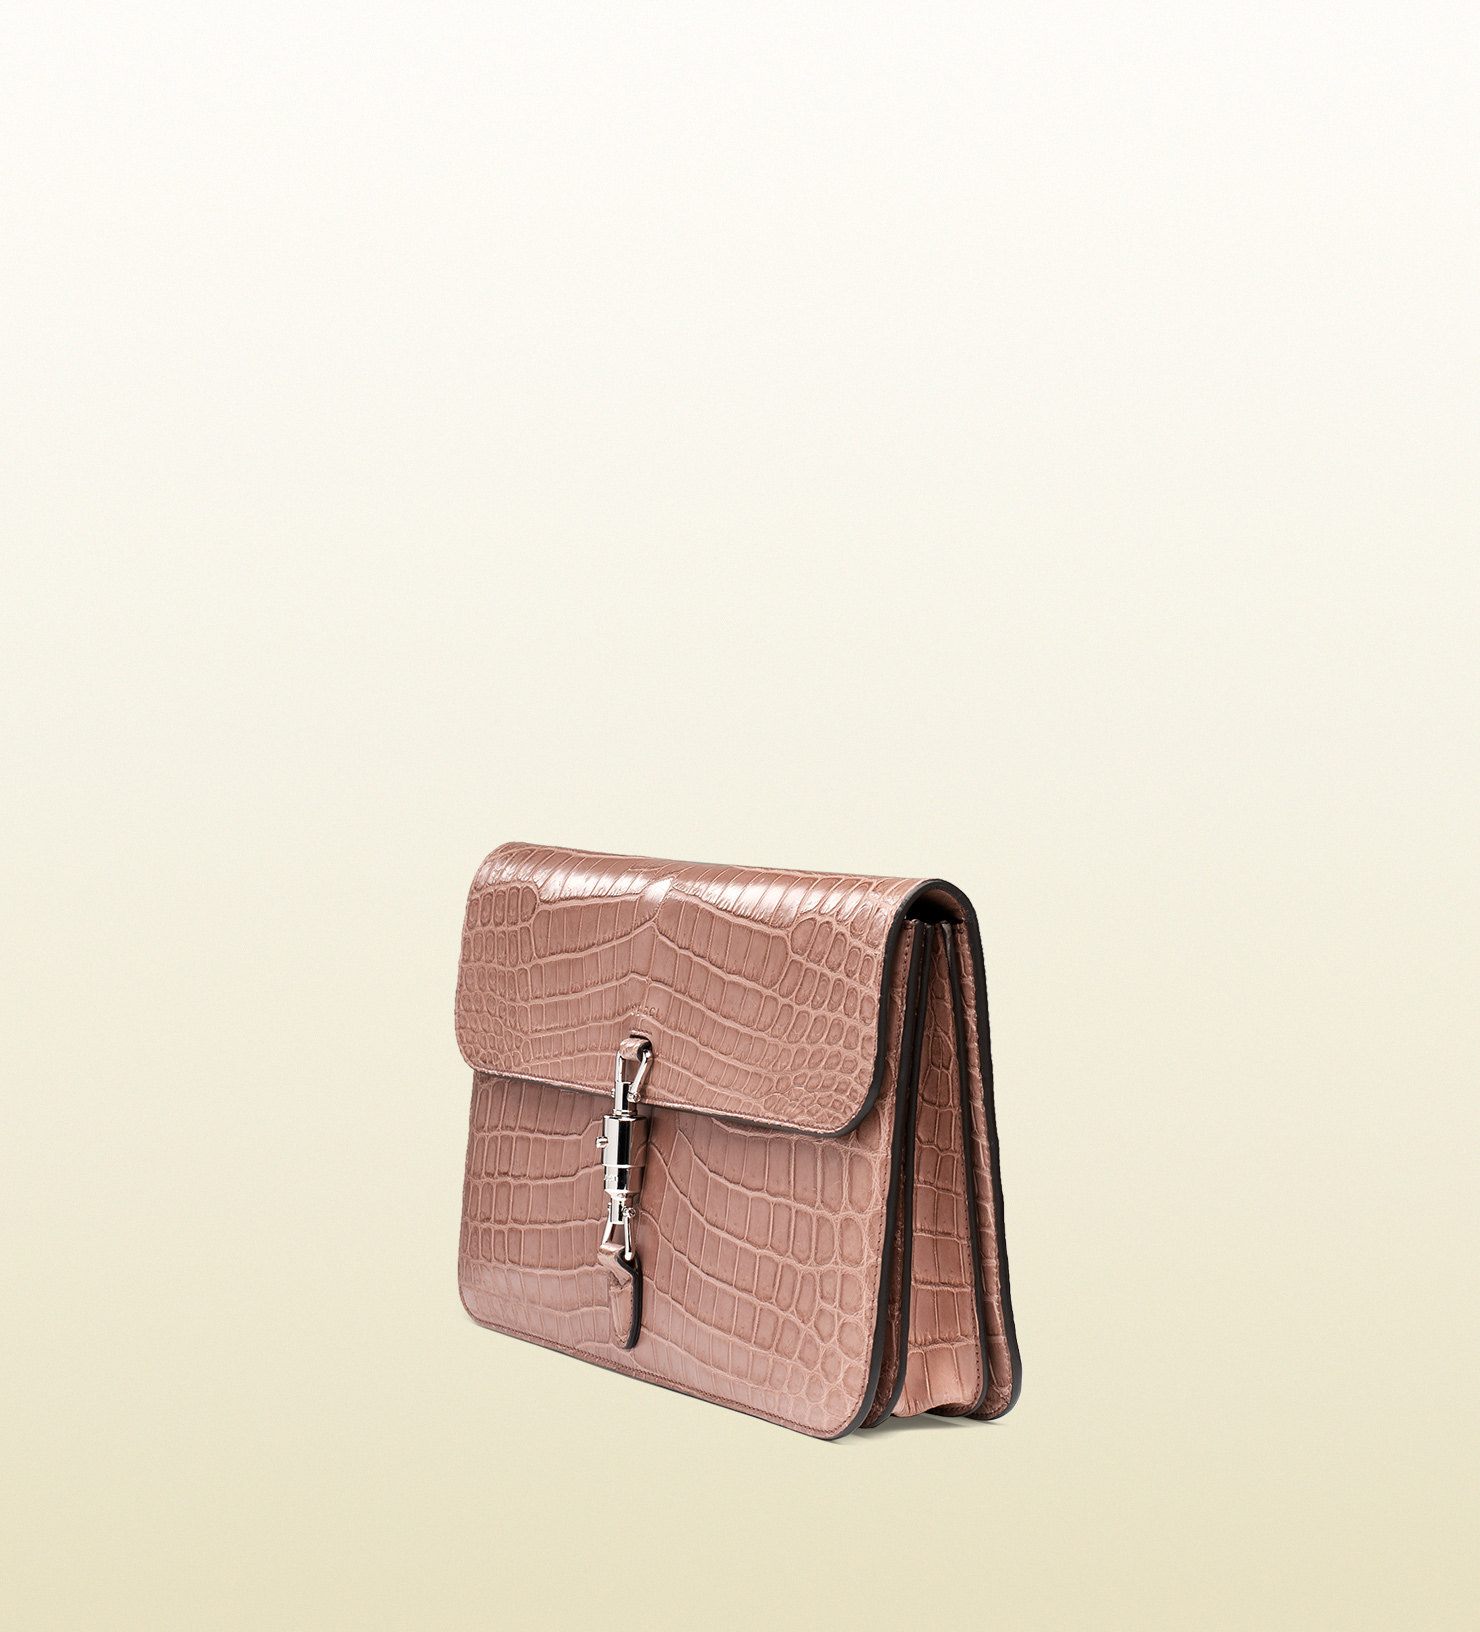 76c1f50bfbe Lyst - Gucci Jackie Soft Crocodile Clutch in Pink